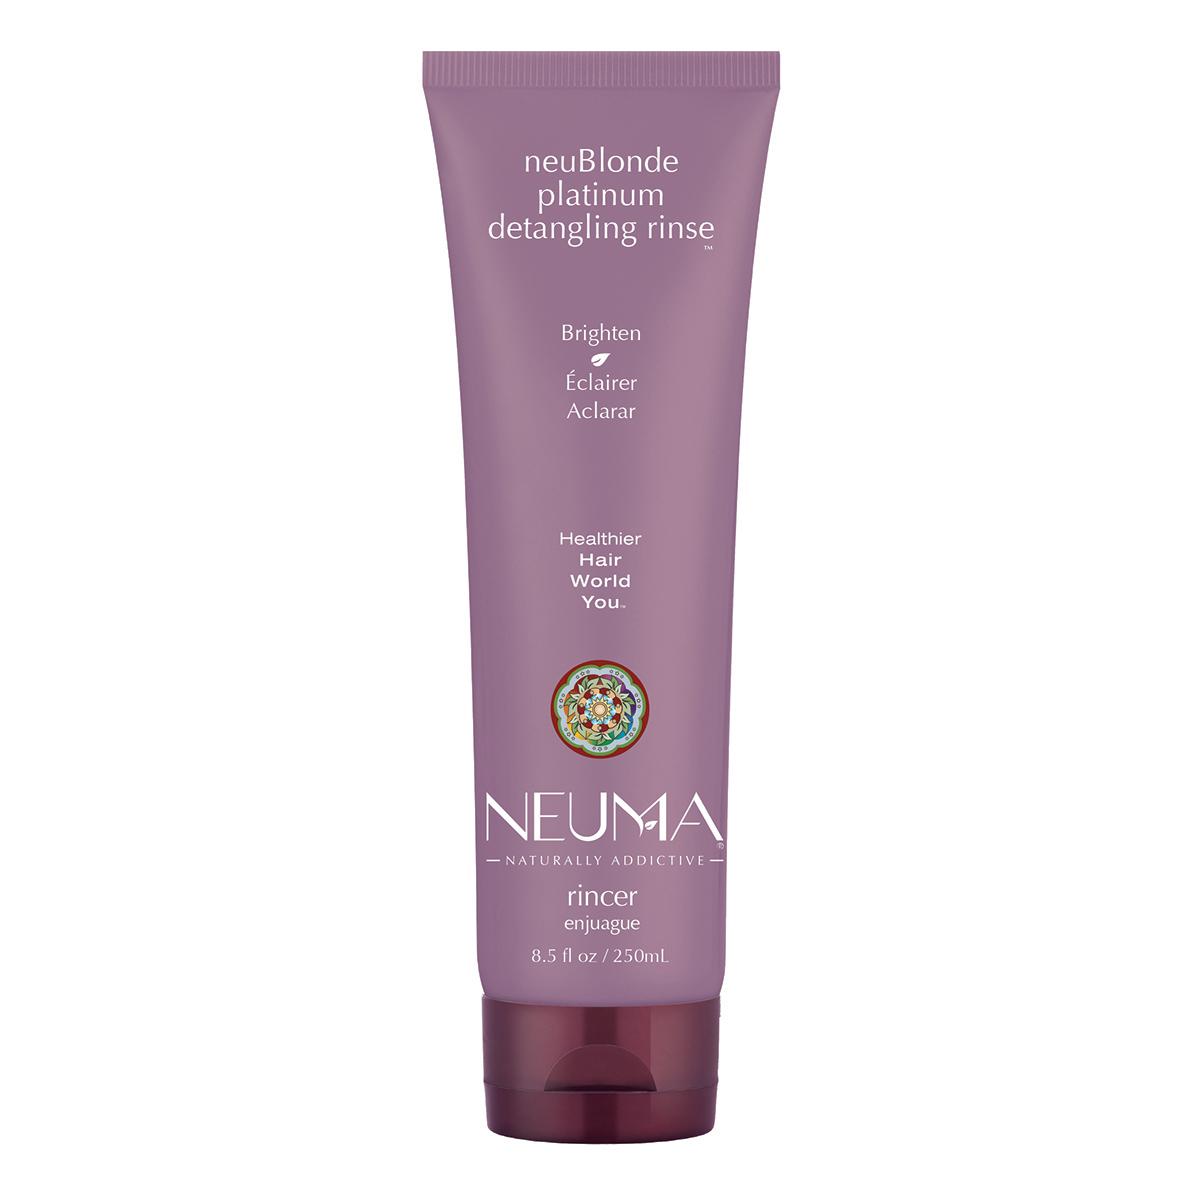 Après-shampoing démêlant neuBlonde platinumMD 250ml